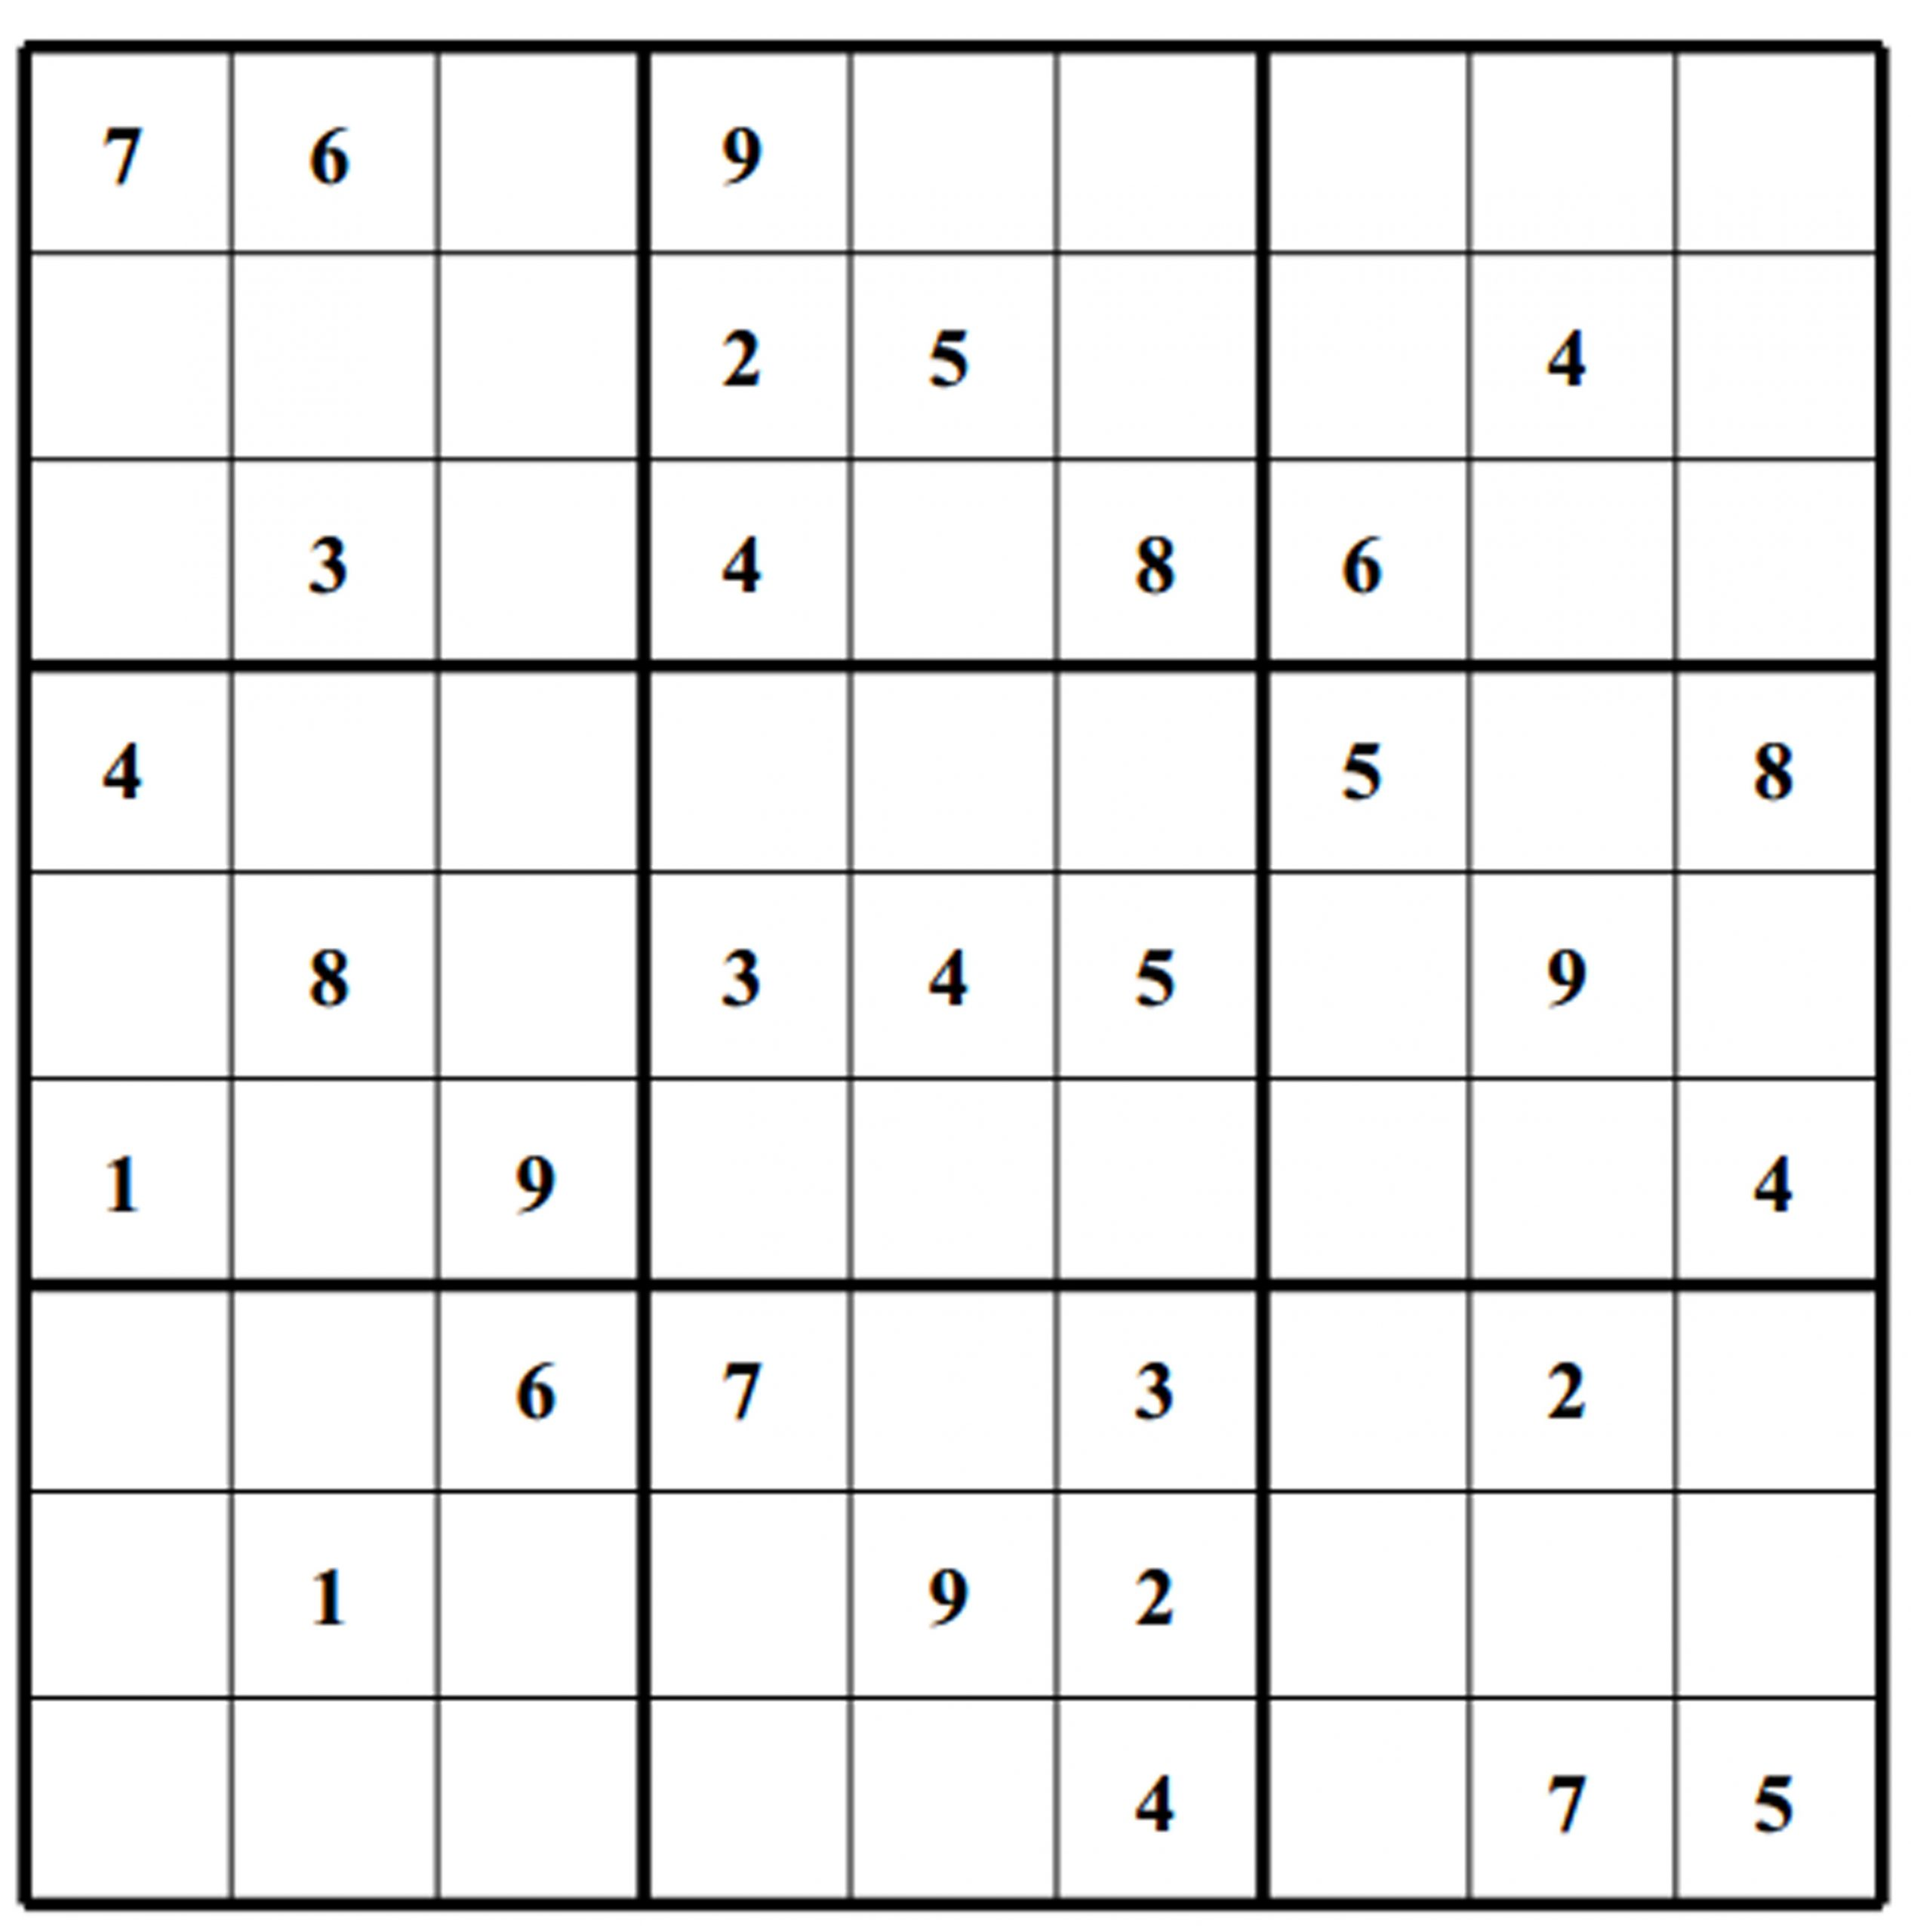 Free Sudoku Puzzles | Enjoy Daily Free Sudoku Puzzles From